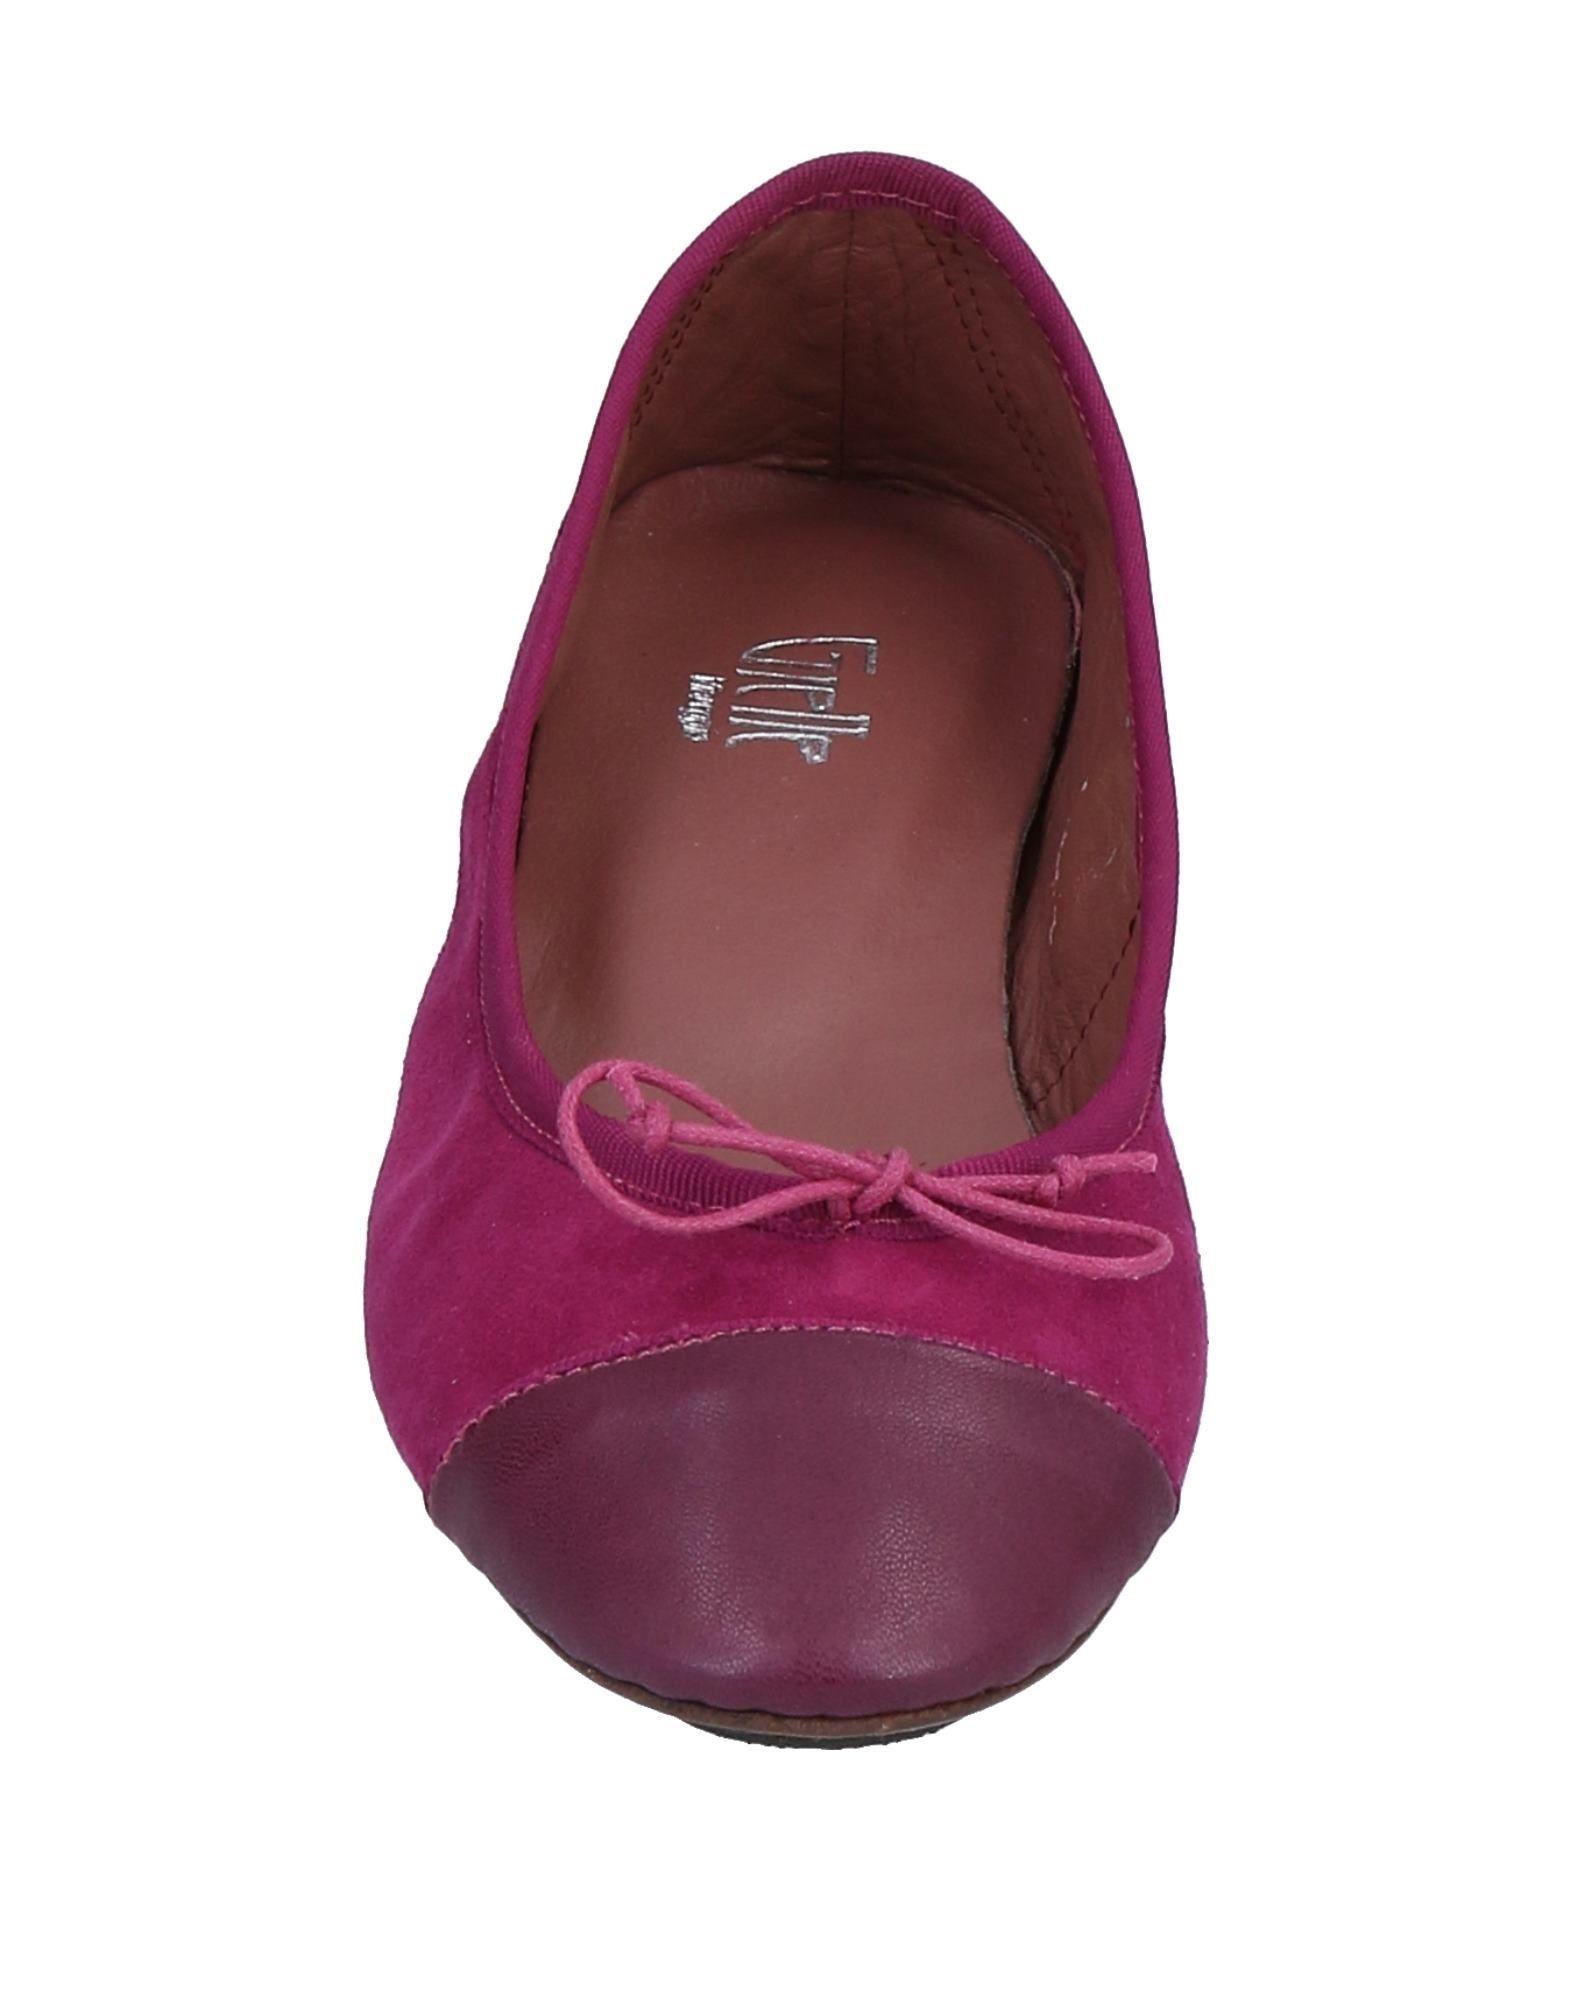 Gielle Ballerinas Damen Qualität 11564981OX Gute Qualität Damen beliebte Schuhe 5ad486